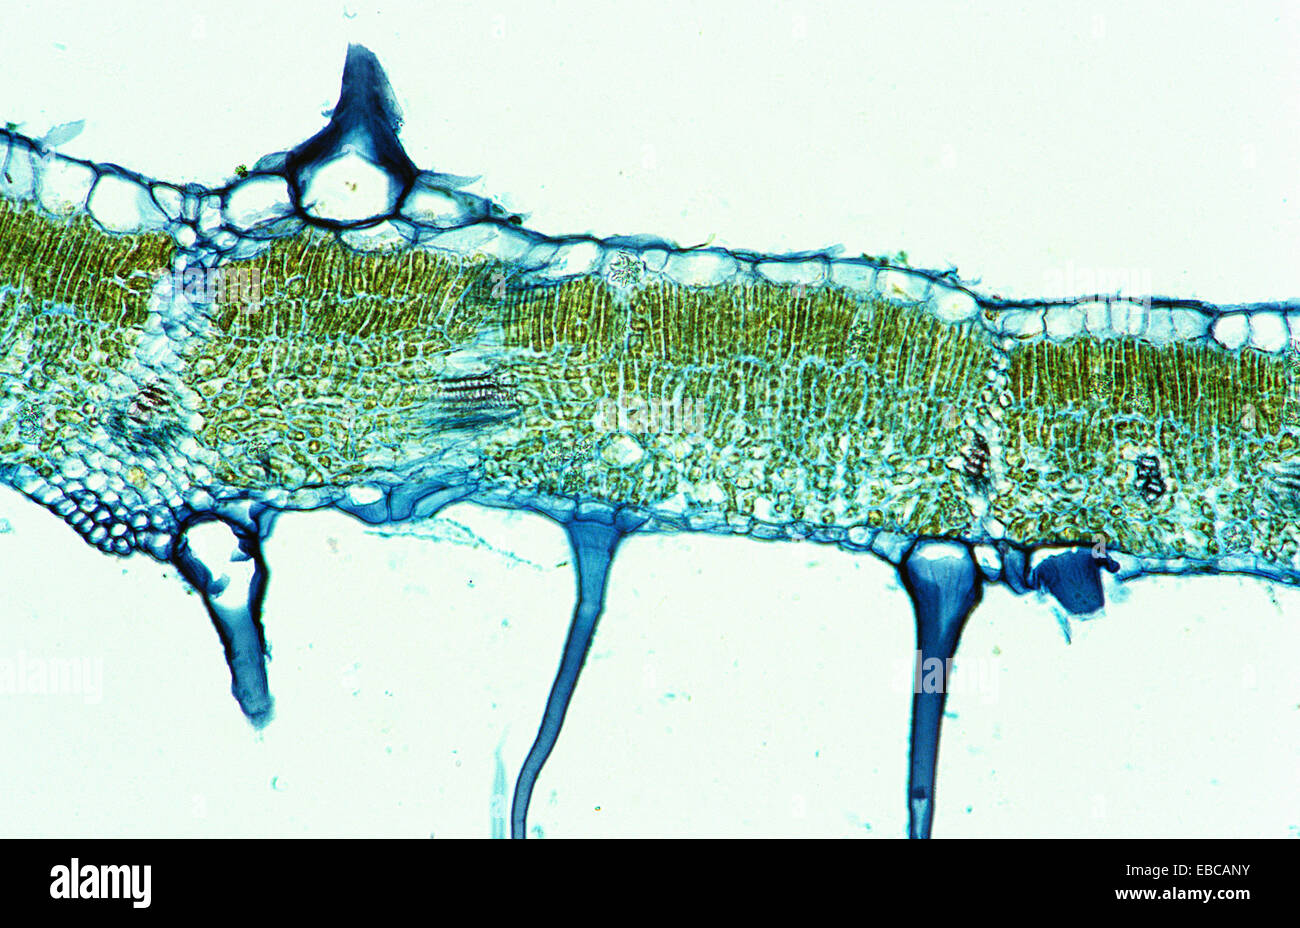 Hoja de ficus elastica, Moraceae, tricoma, 200 x Microscopio óptico ...